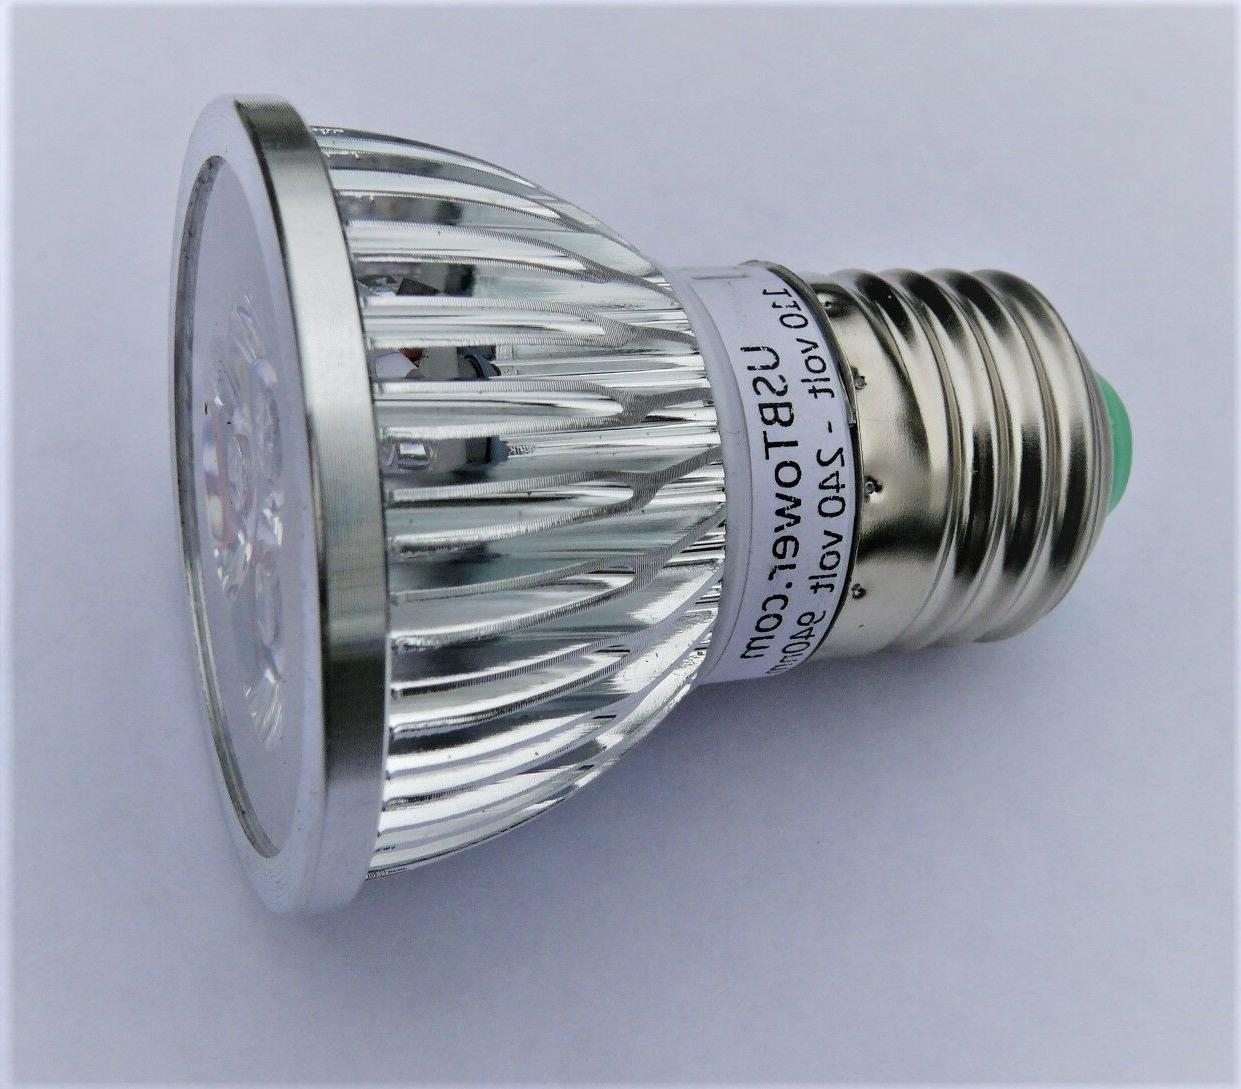 LED Night vision Illuminator Lamp Bulb